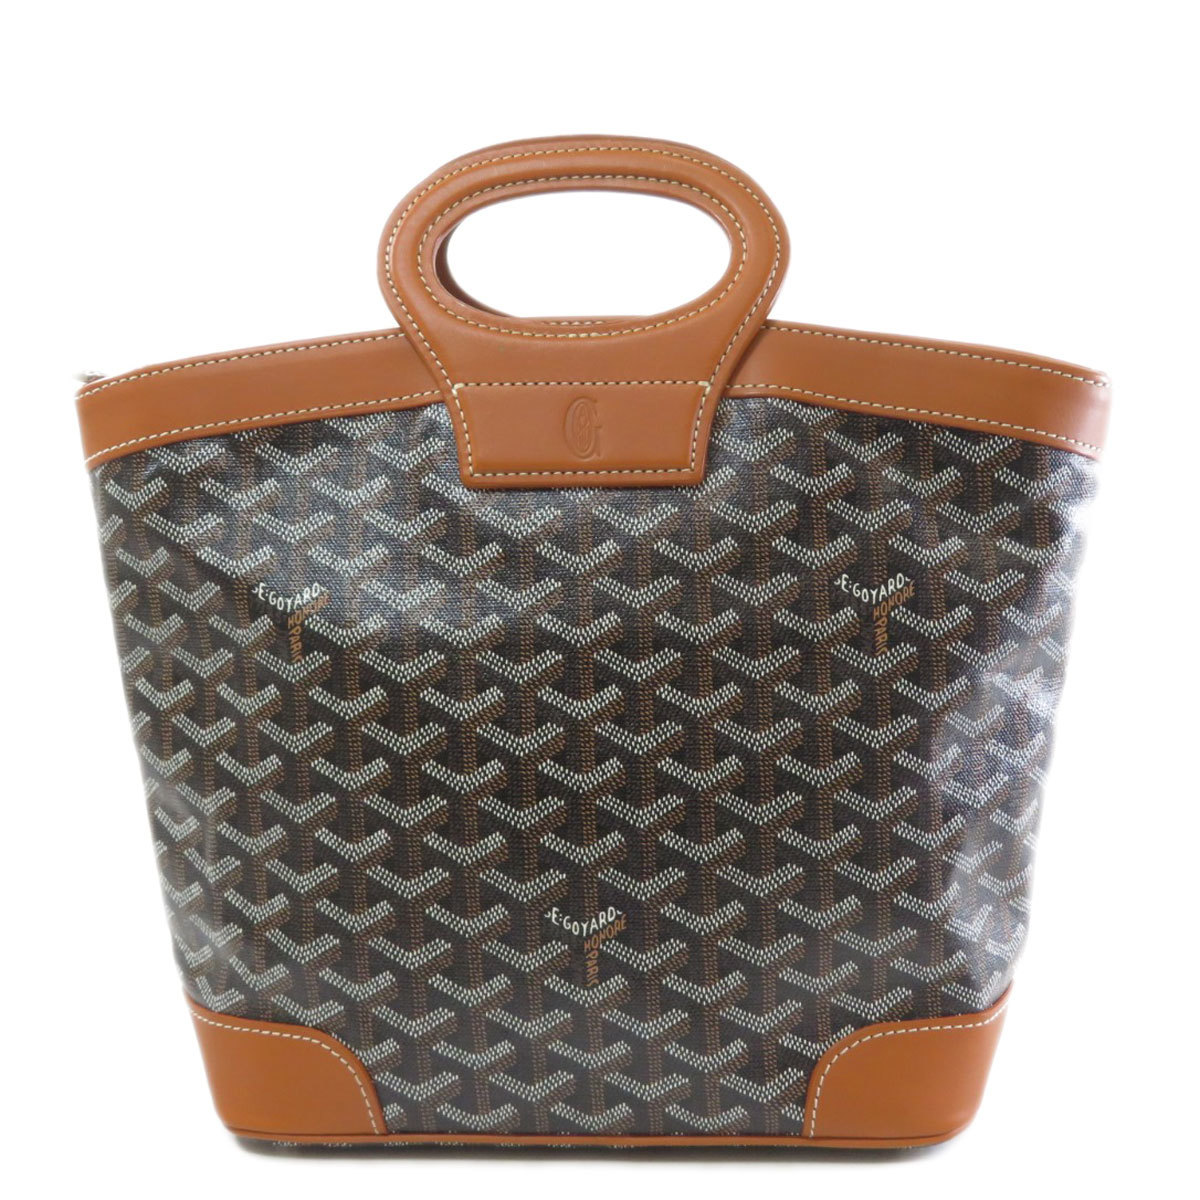 Goyard Beluga PM Handbag PVC Leather Ladies